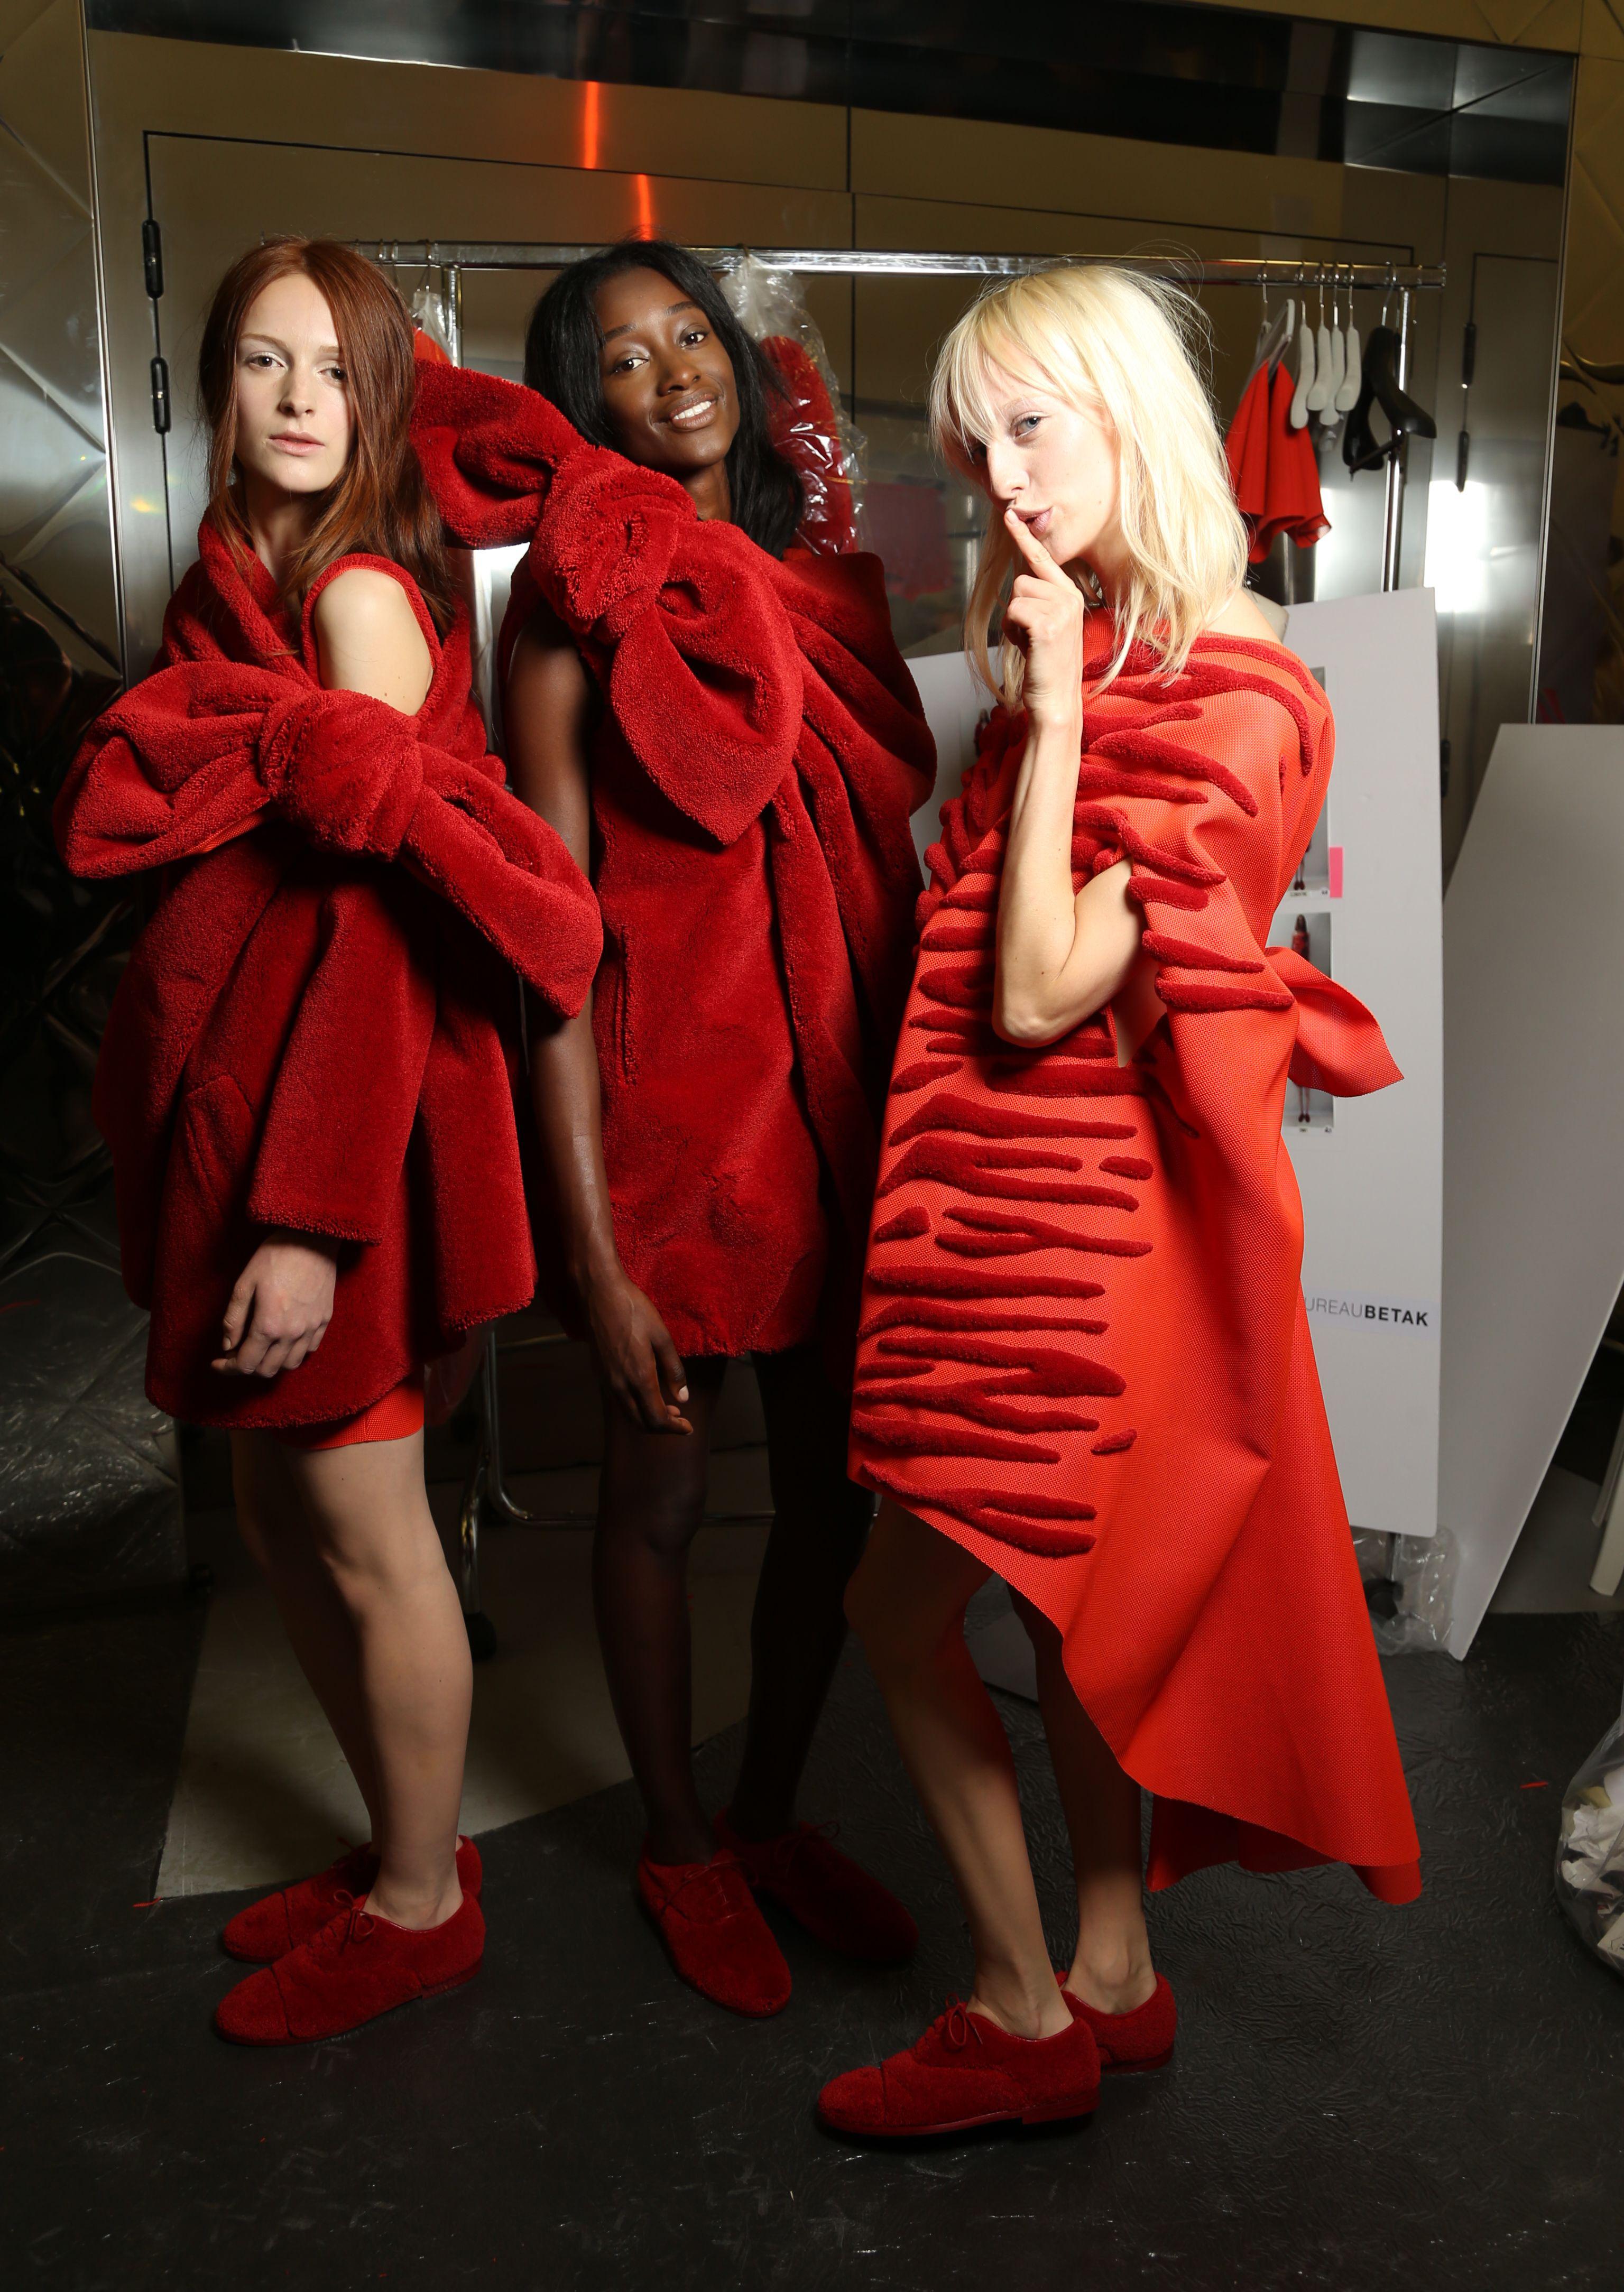 Viktor & Rolf show, Haute Couture Fall Winter 2014, Paris Fashion Week, France - 09 Jul 2014